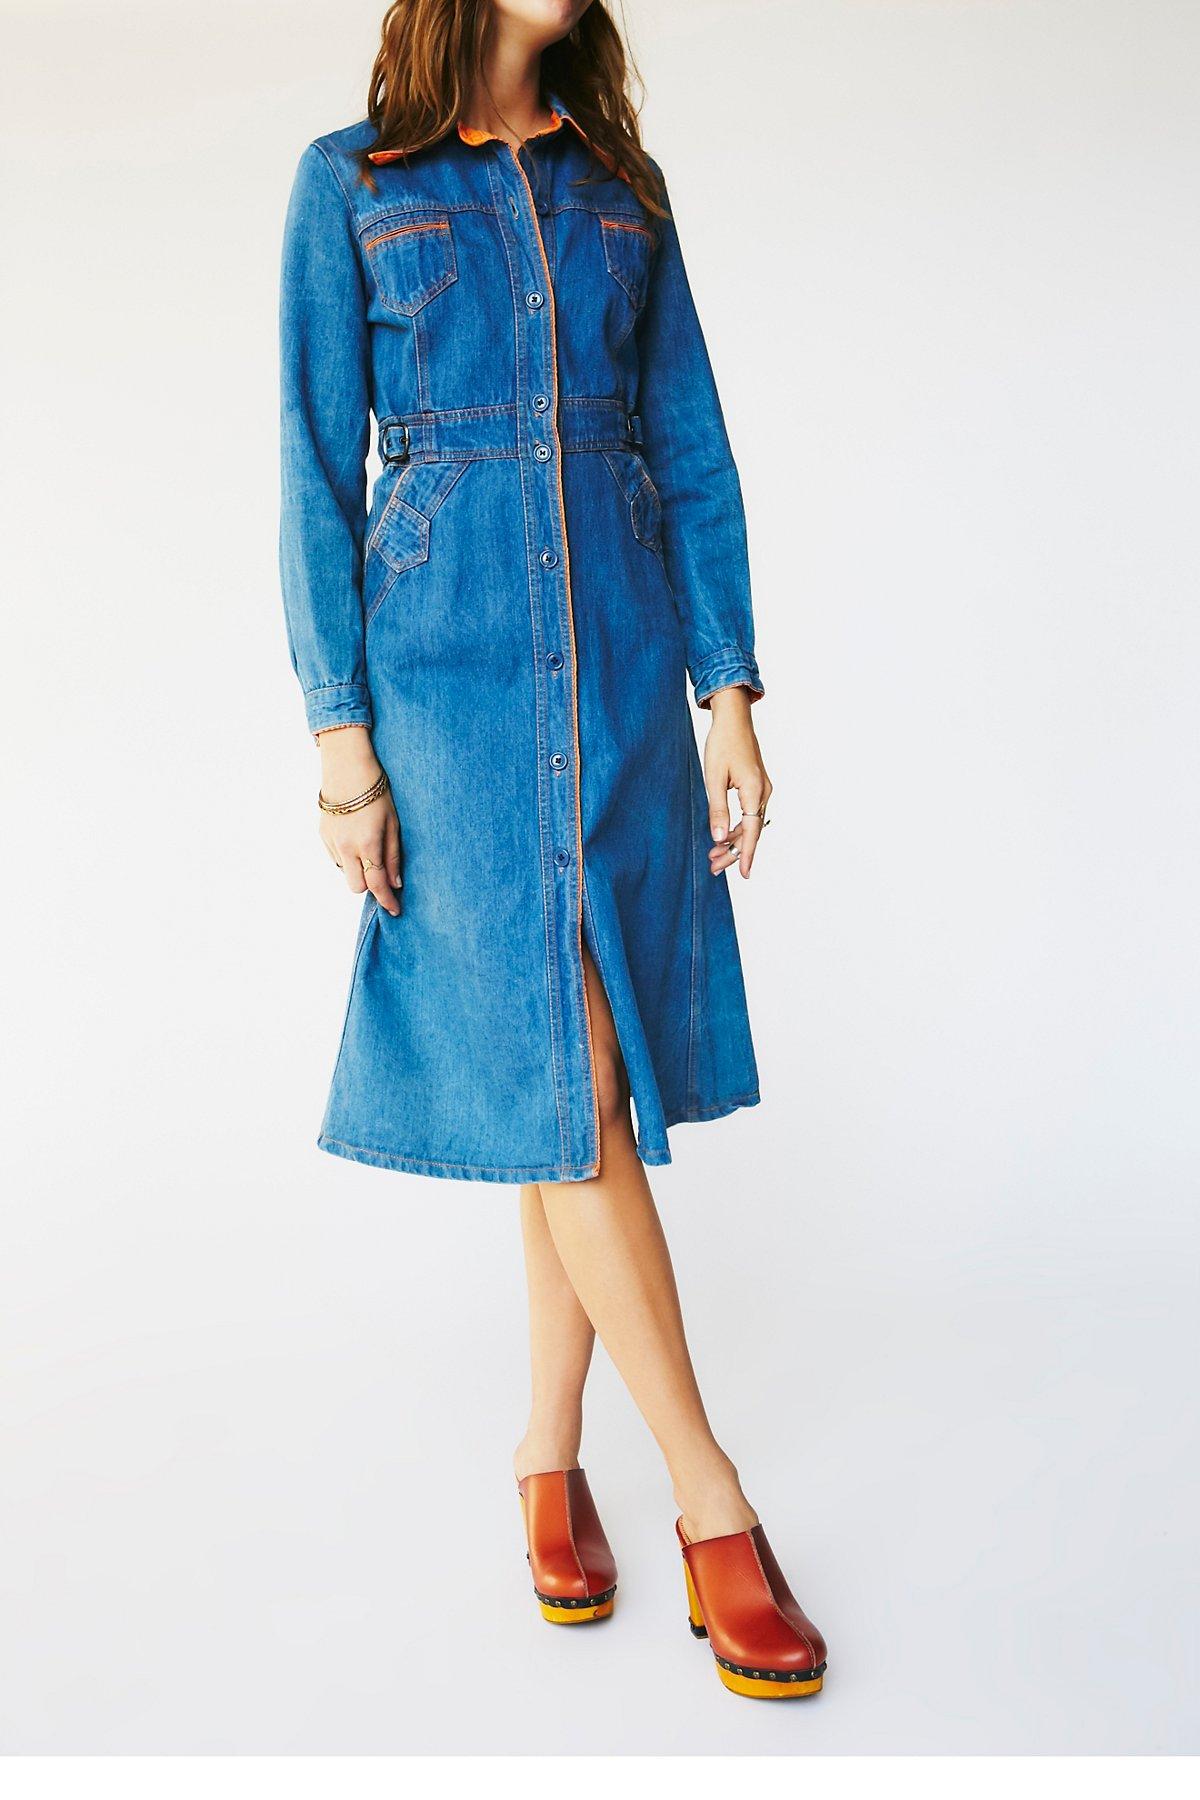 Vintage 1970s Denim Dress